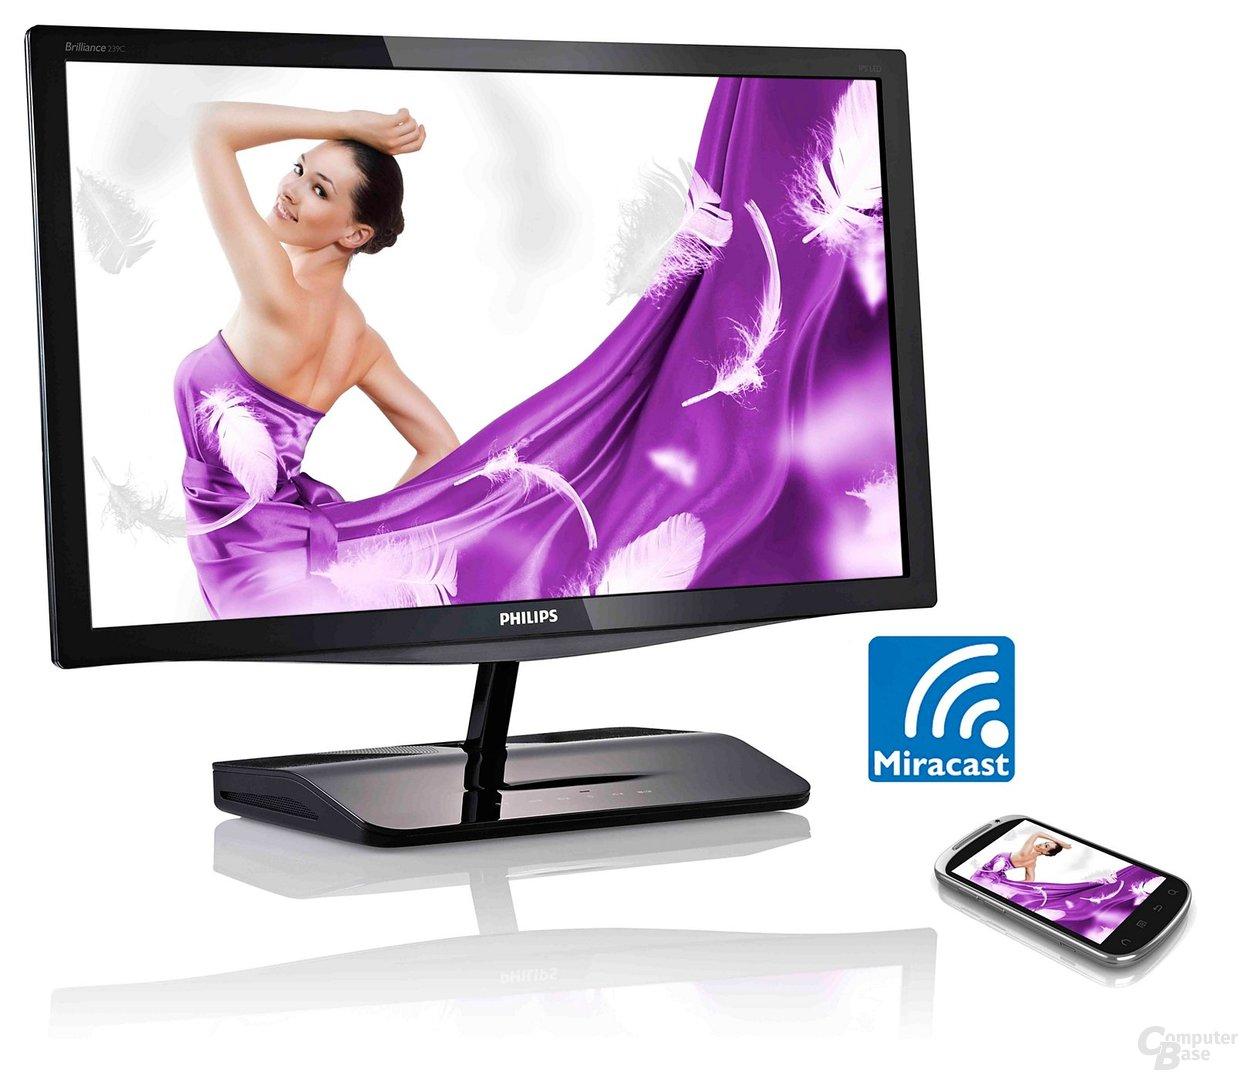 Philips 239C4QHWAB mit Miracast